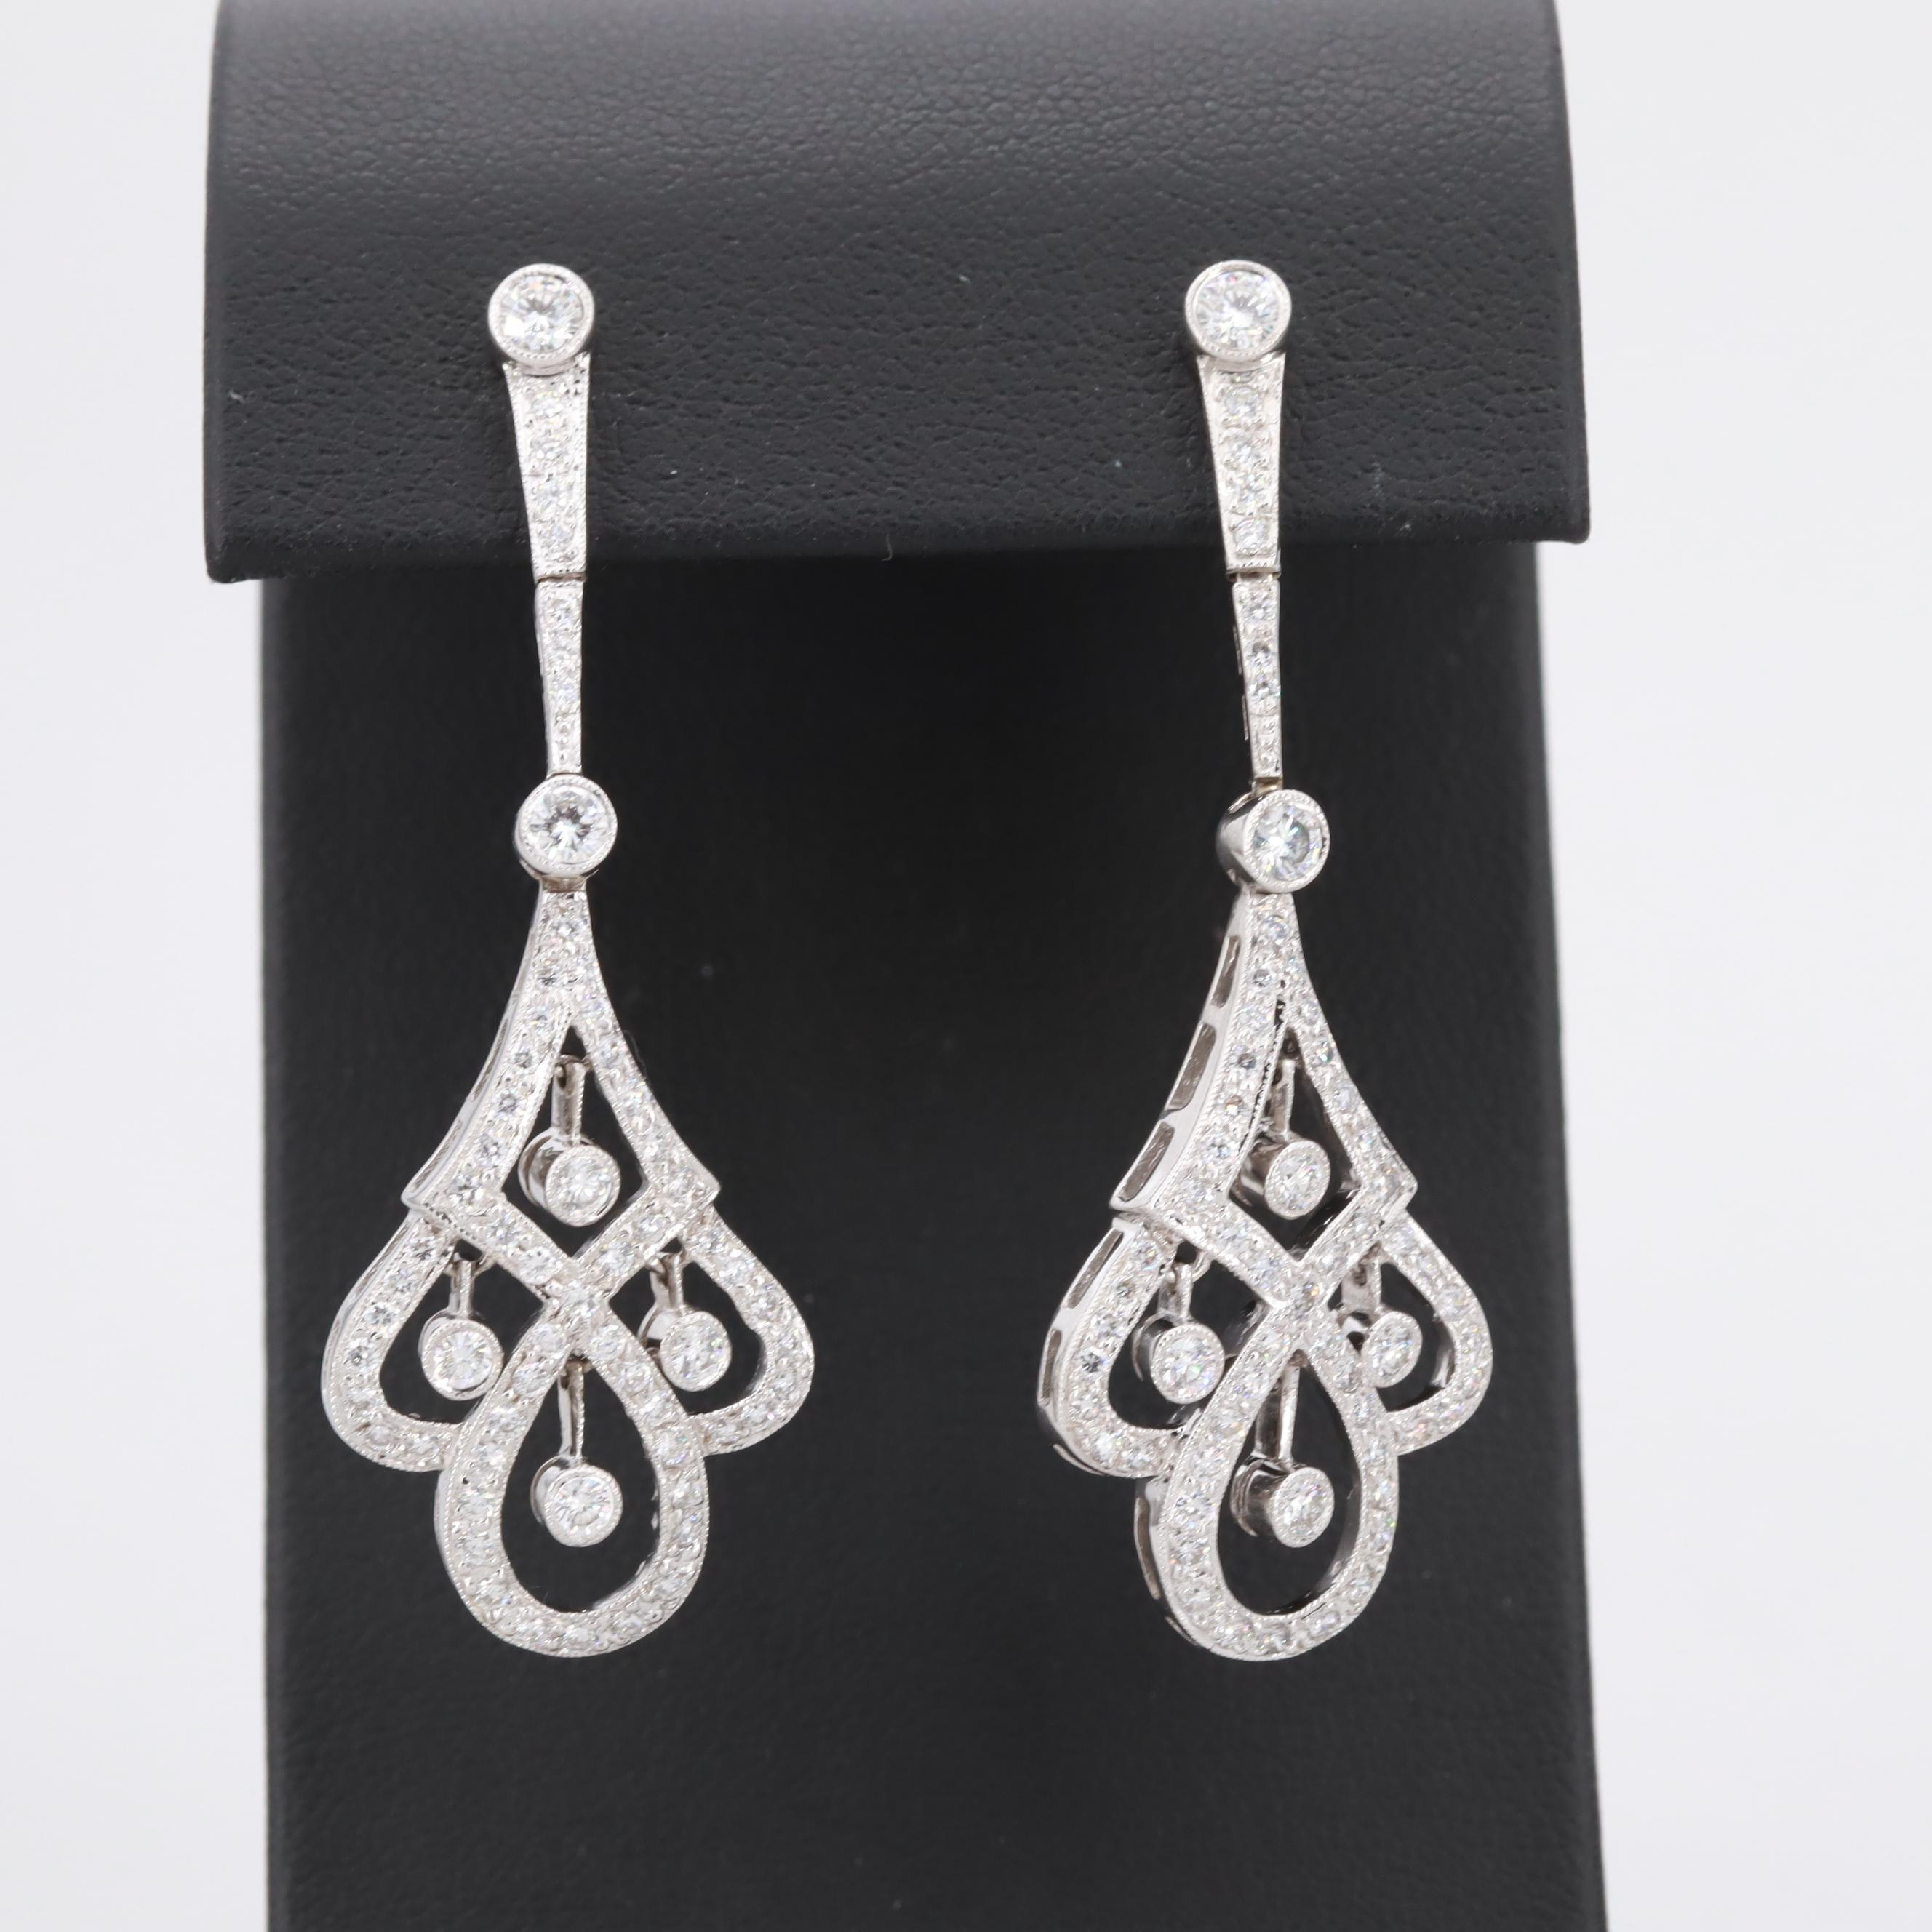 18K White Gold 1.77 CTW Diamond Chandelier Earrings